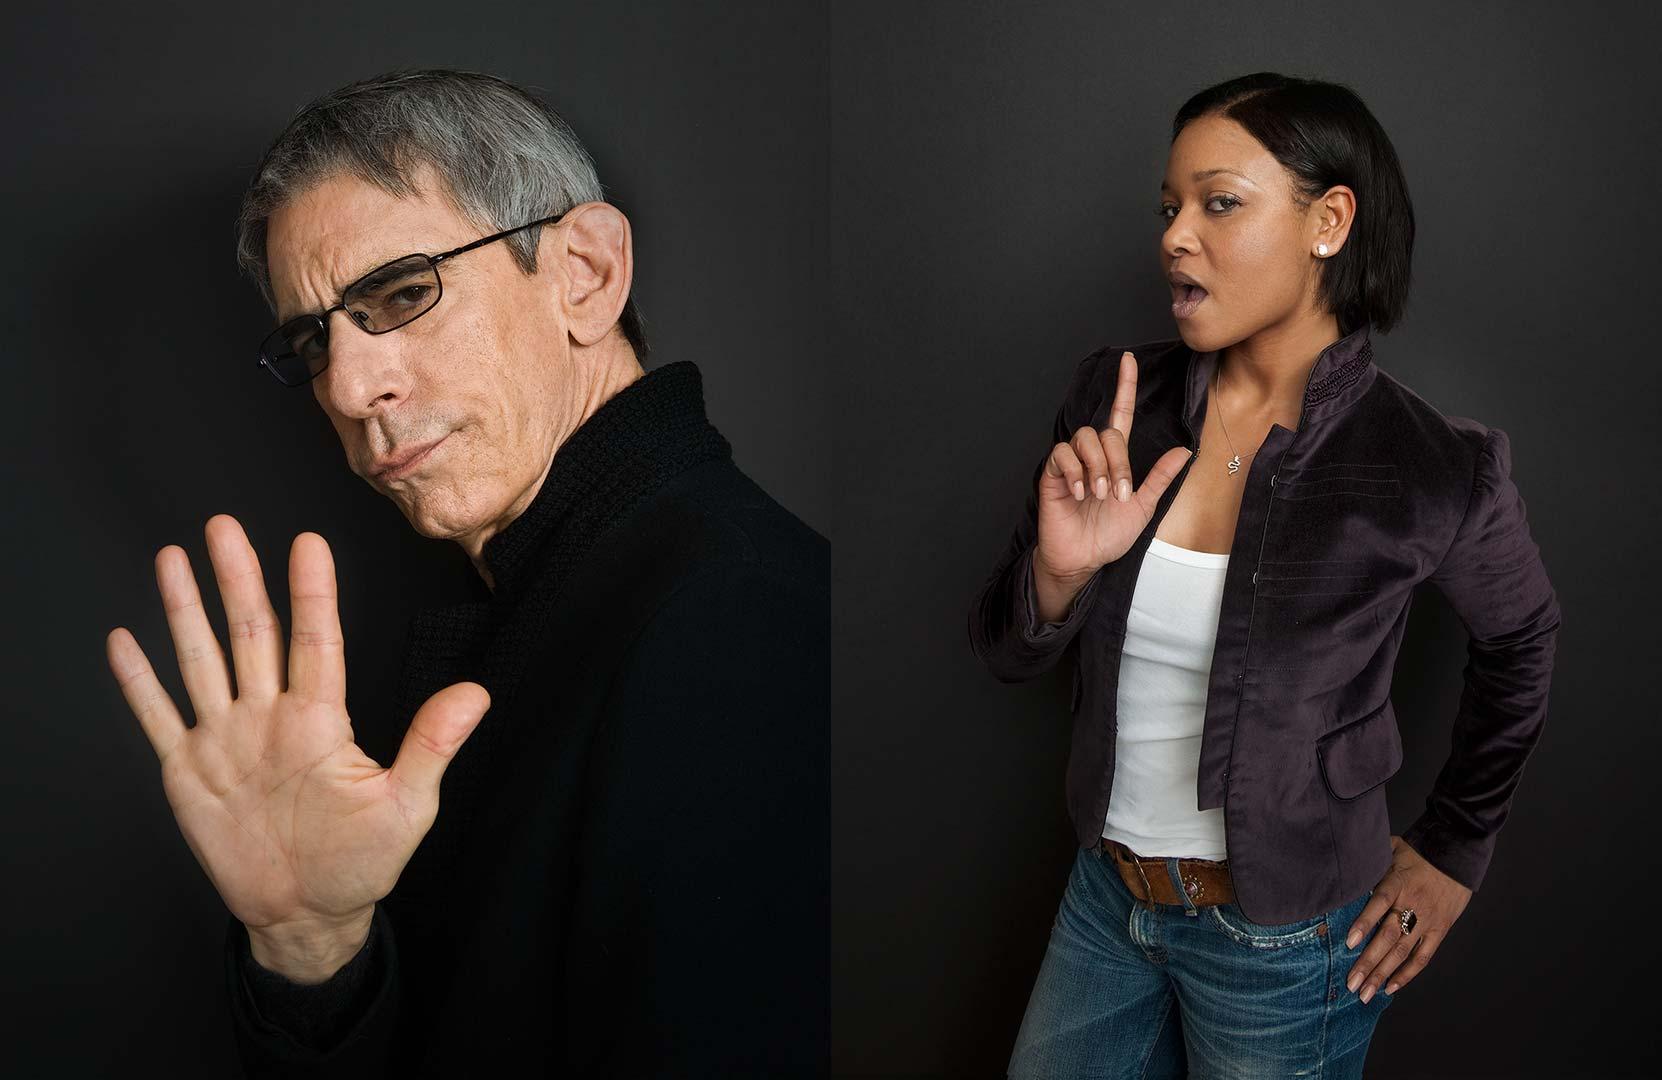 Celebrity portrait photography of Richard Belzer and Tamala Jones